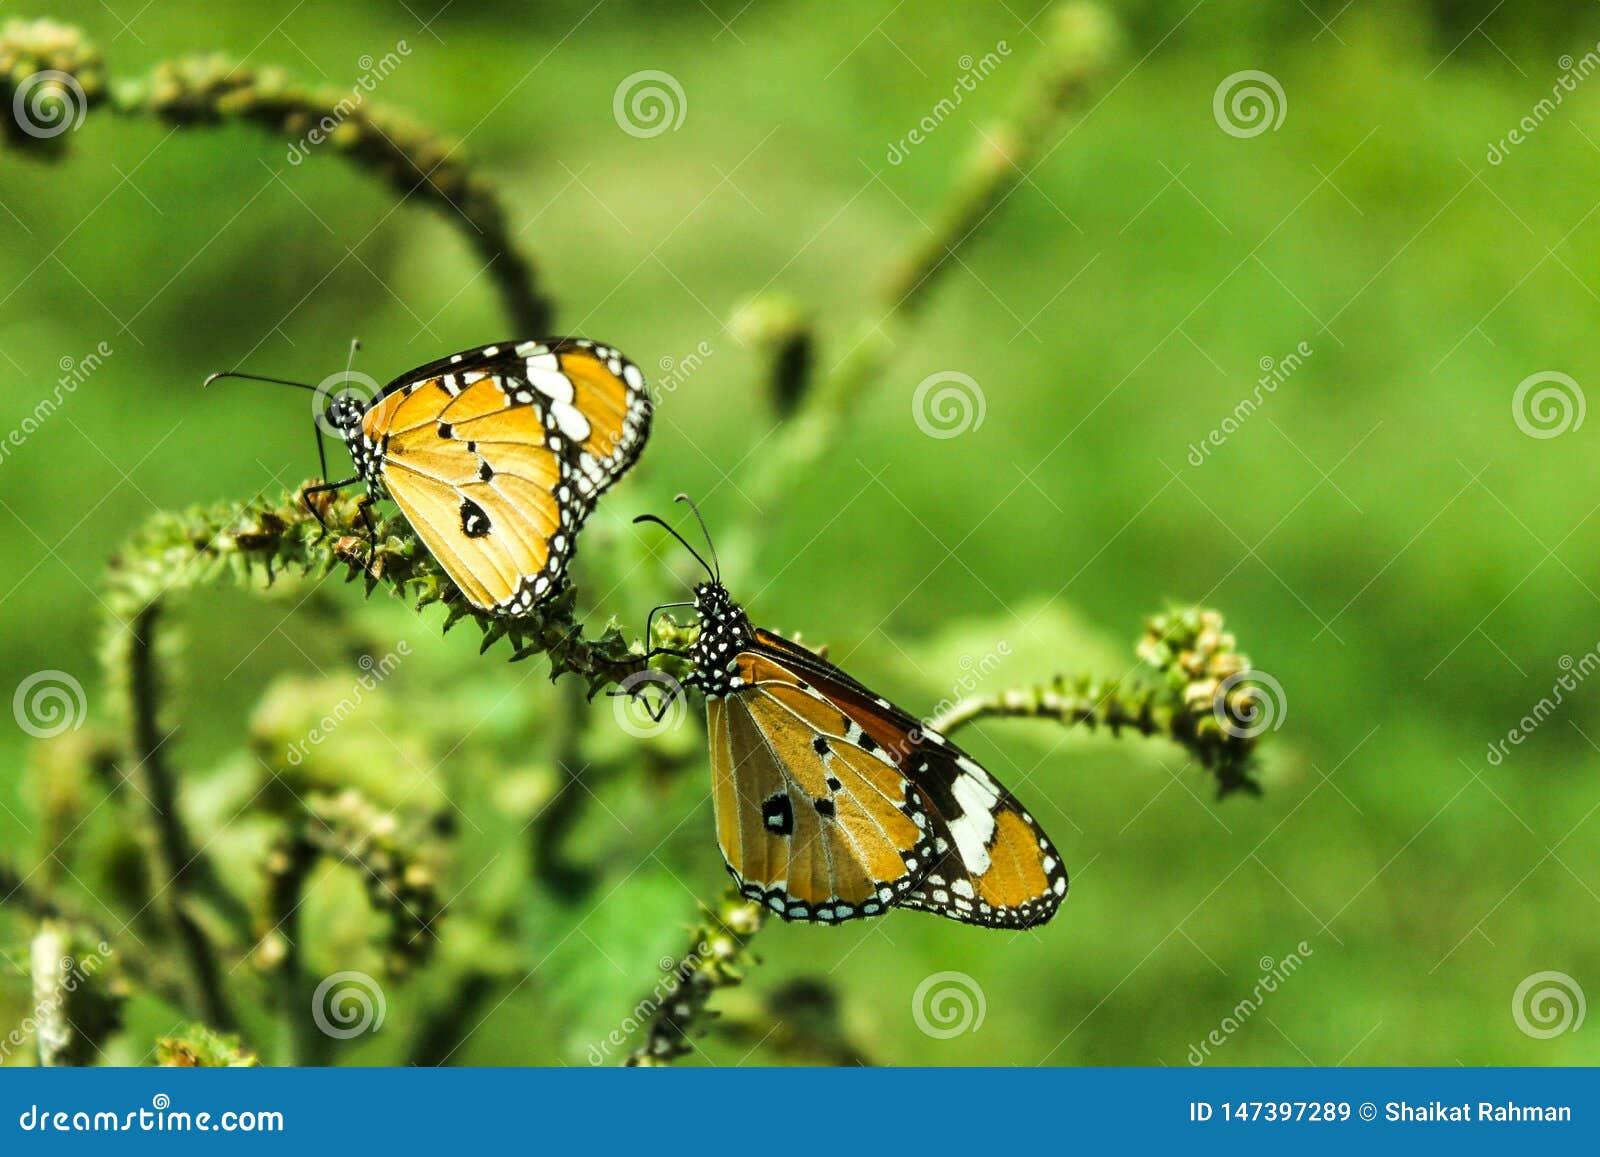 Twee Mooie Gele Vlinders op de boom